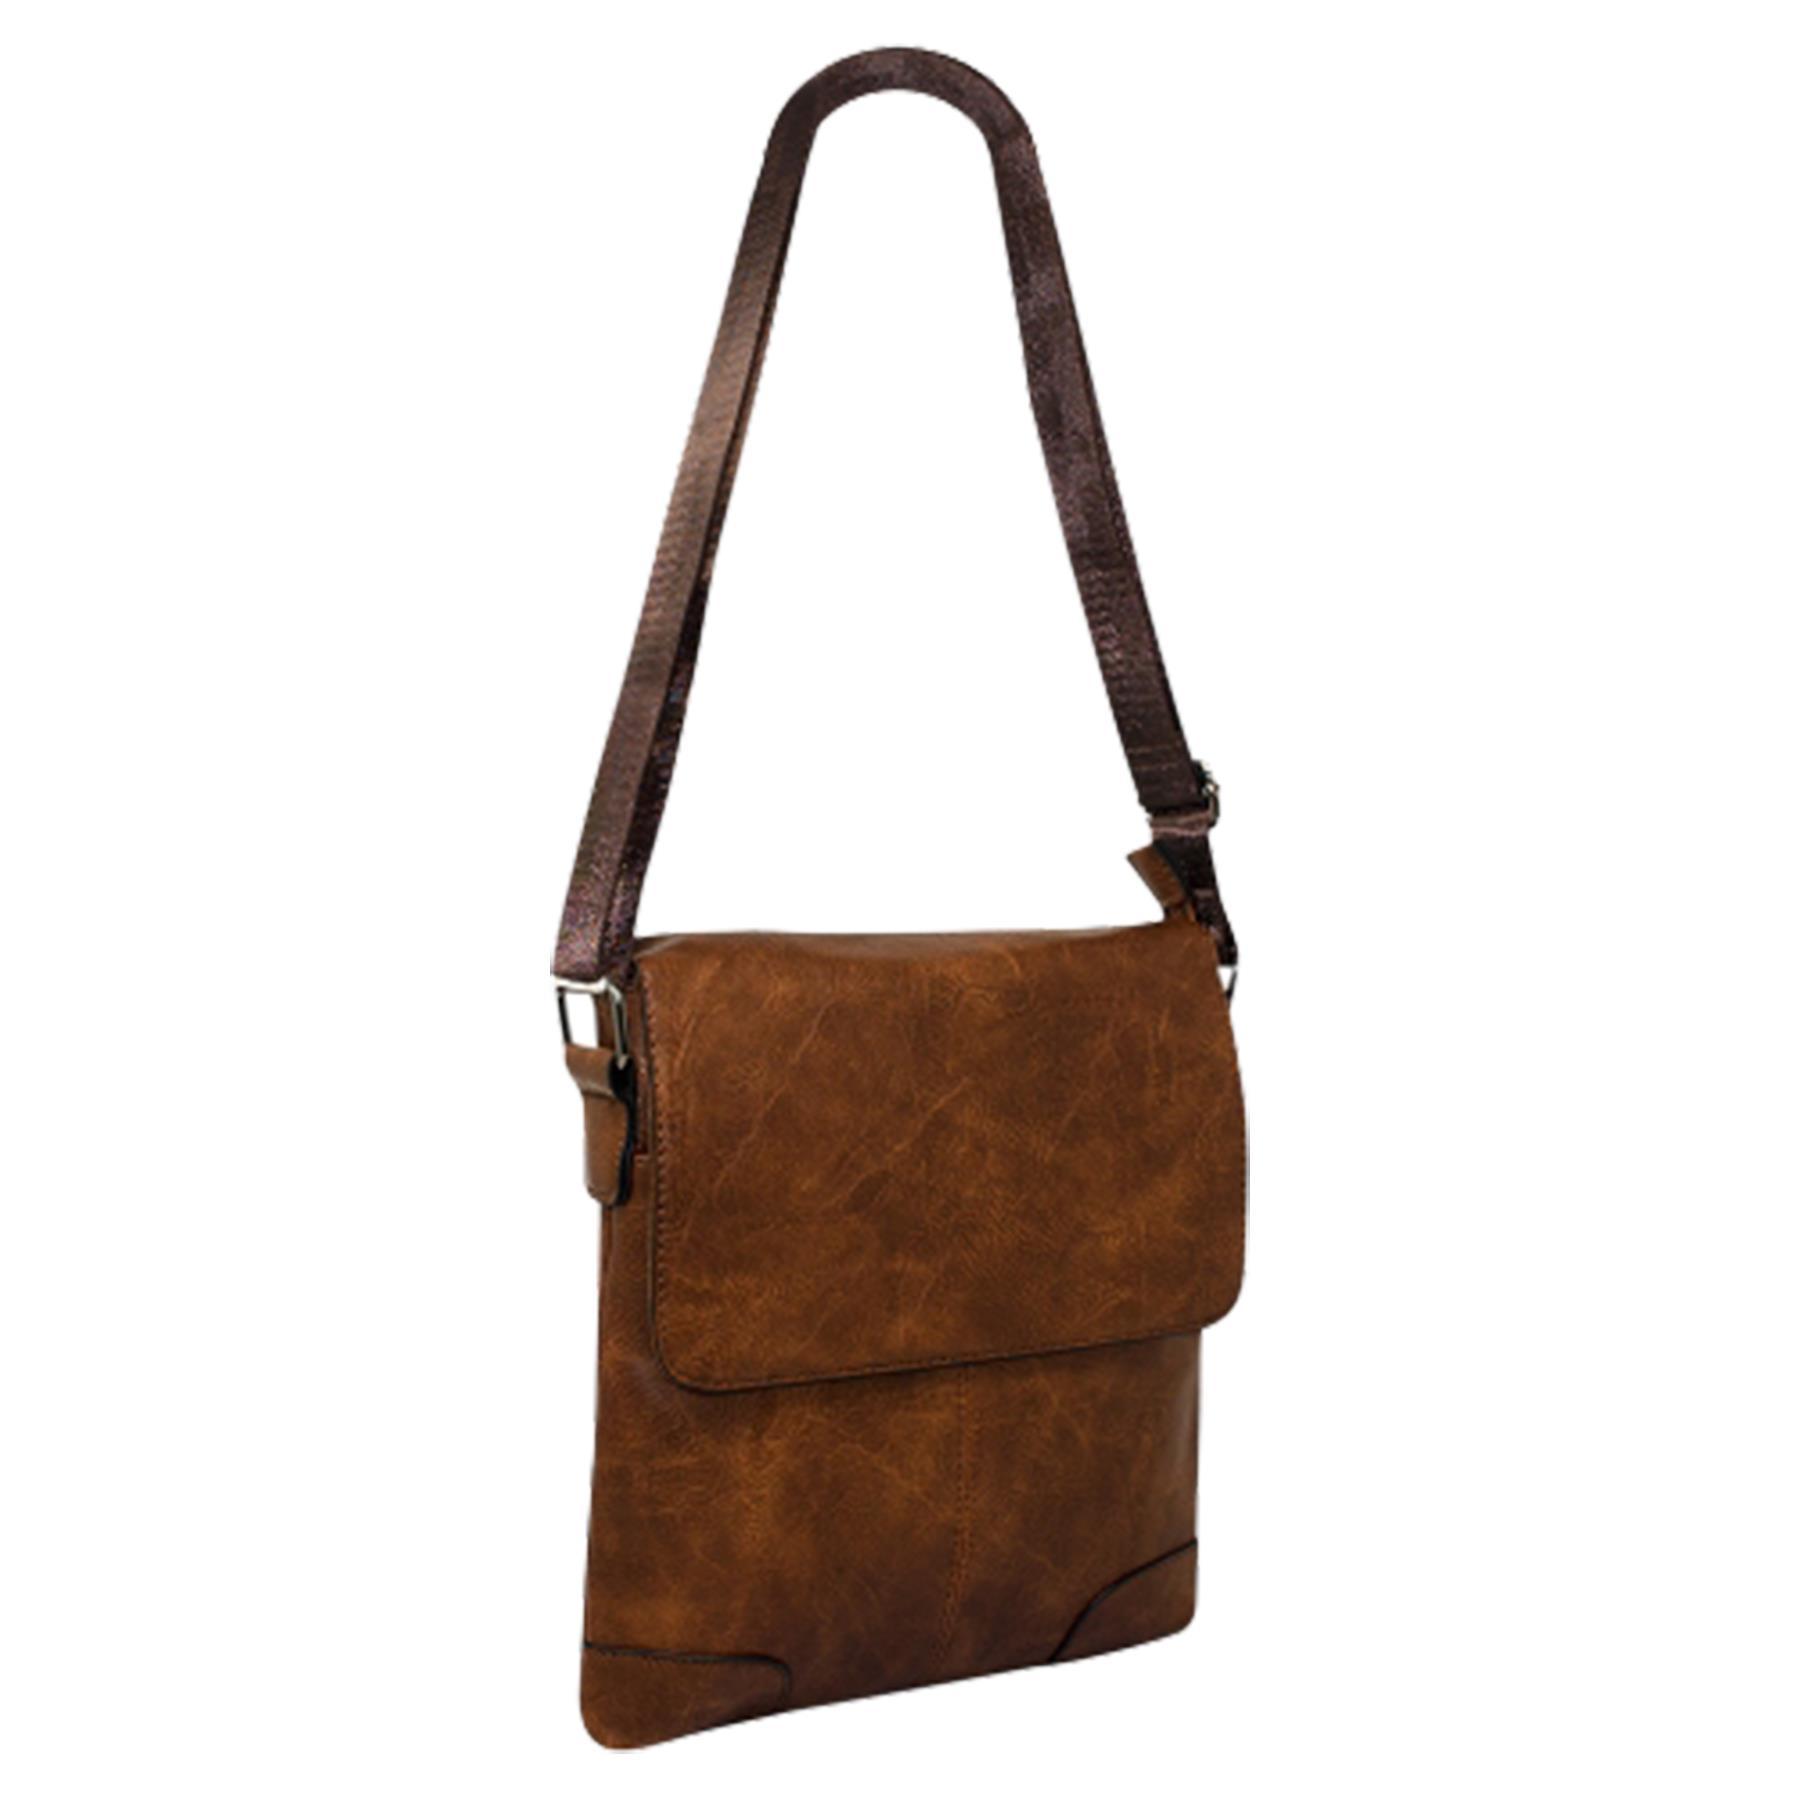 New-Plain-Faux-Leather-Men-s-Travel-Casual-Flap-Over-Messenger-Bag thumbnail 15